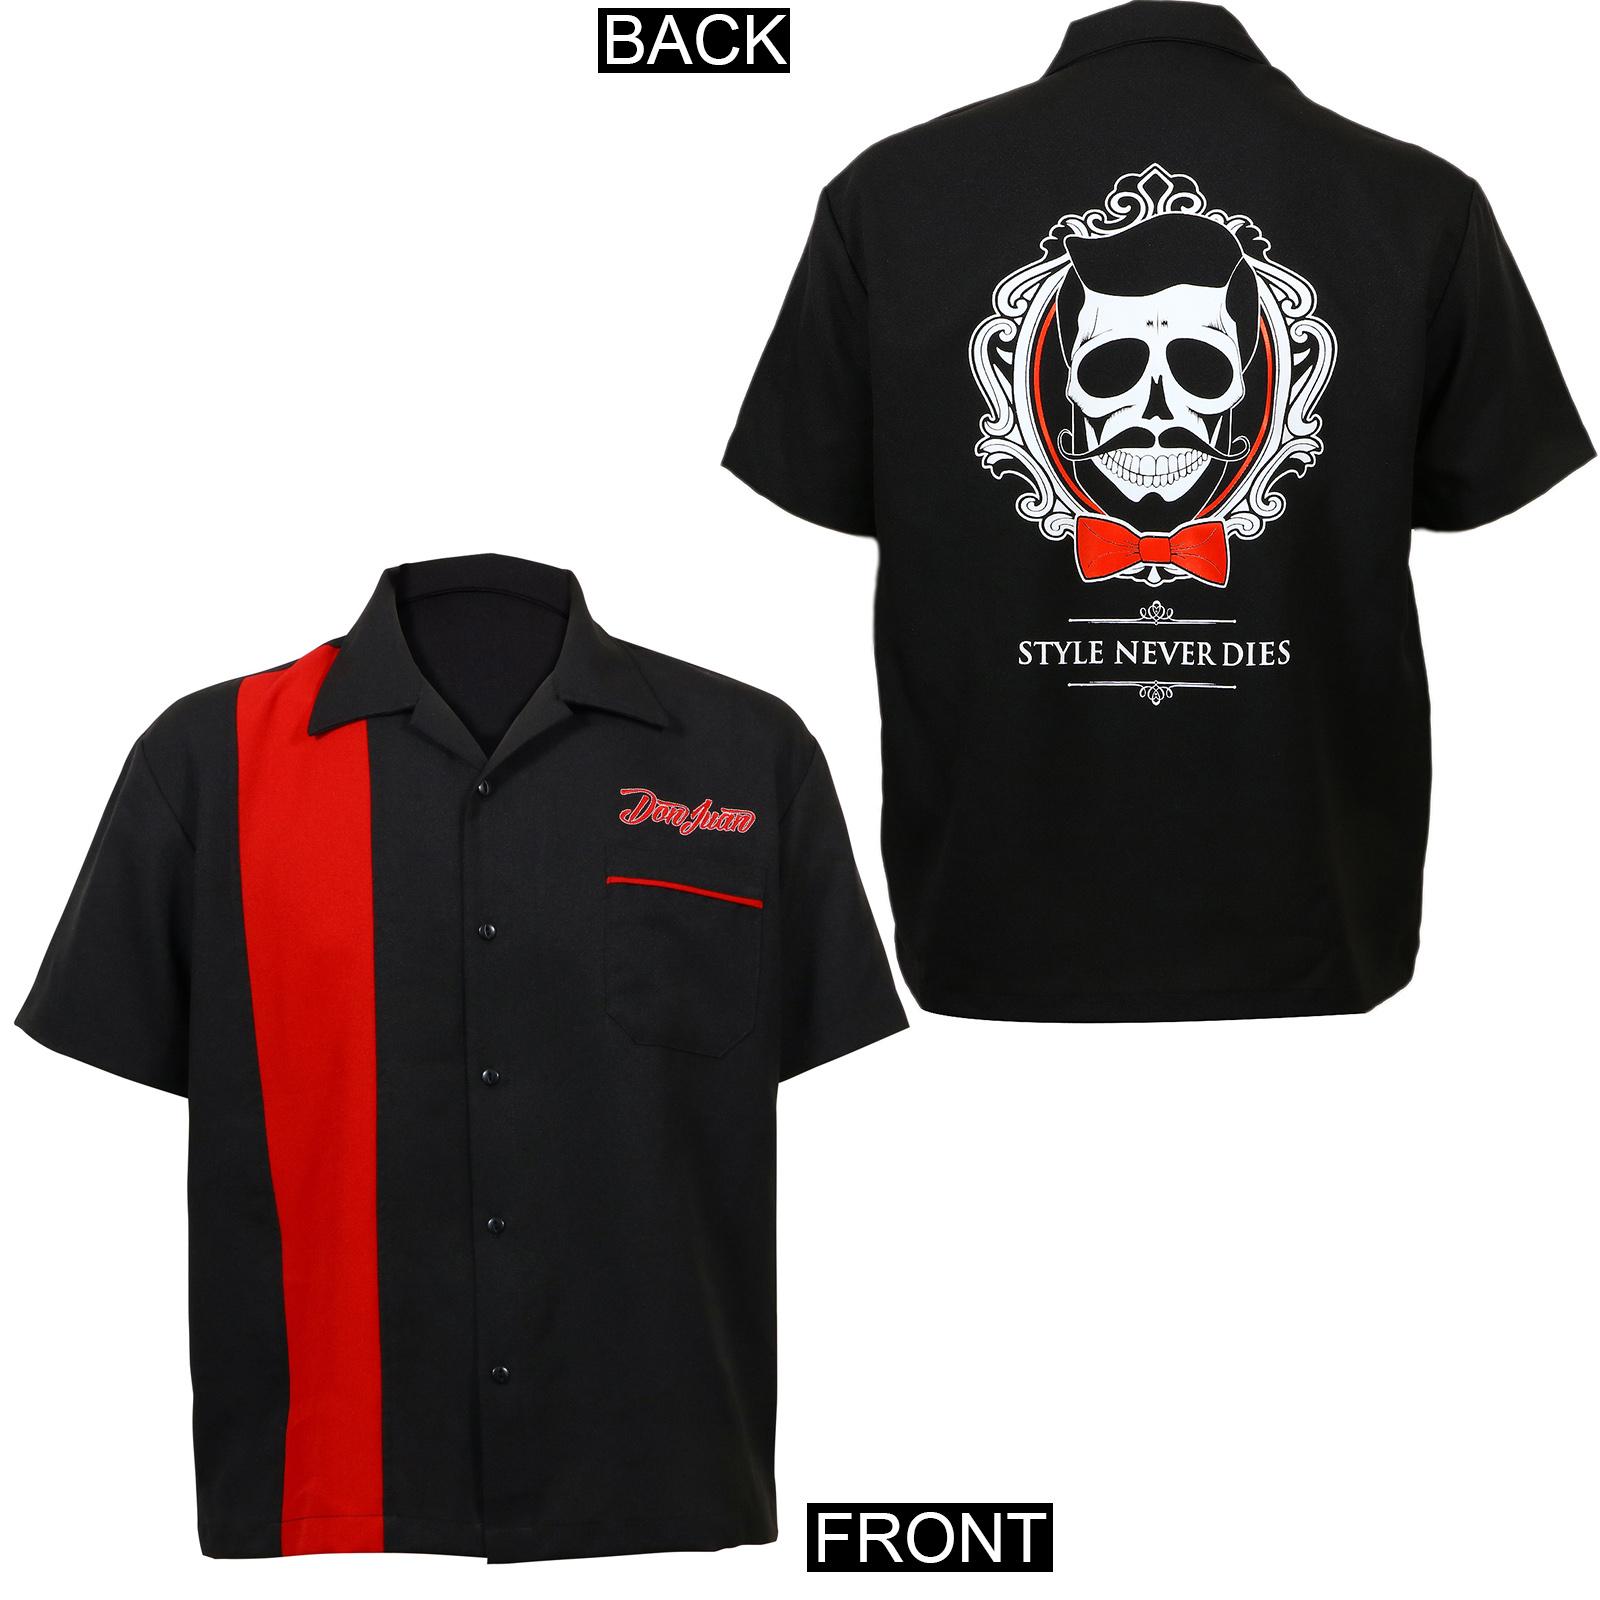 Don Juan Jumbo Style Never Dies Bowling Shirt